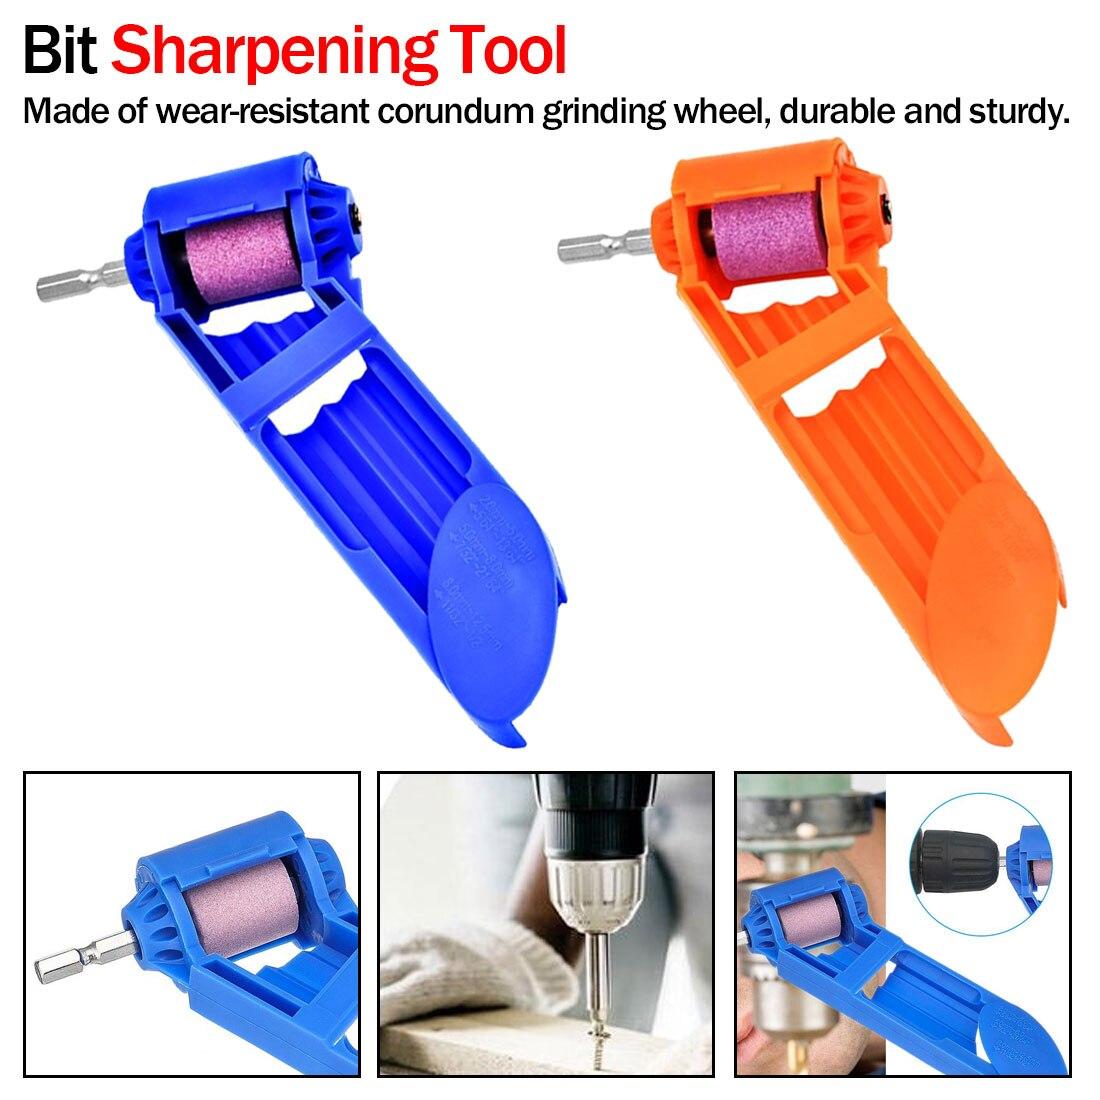 Portable Drill Bit Sharpener Wear Resisting Corundum Grinding Wheel Electric Drill Auxiliary Tool